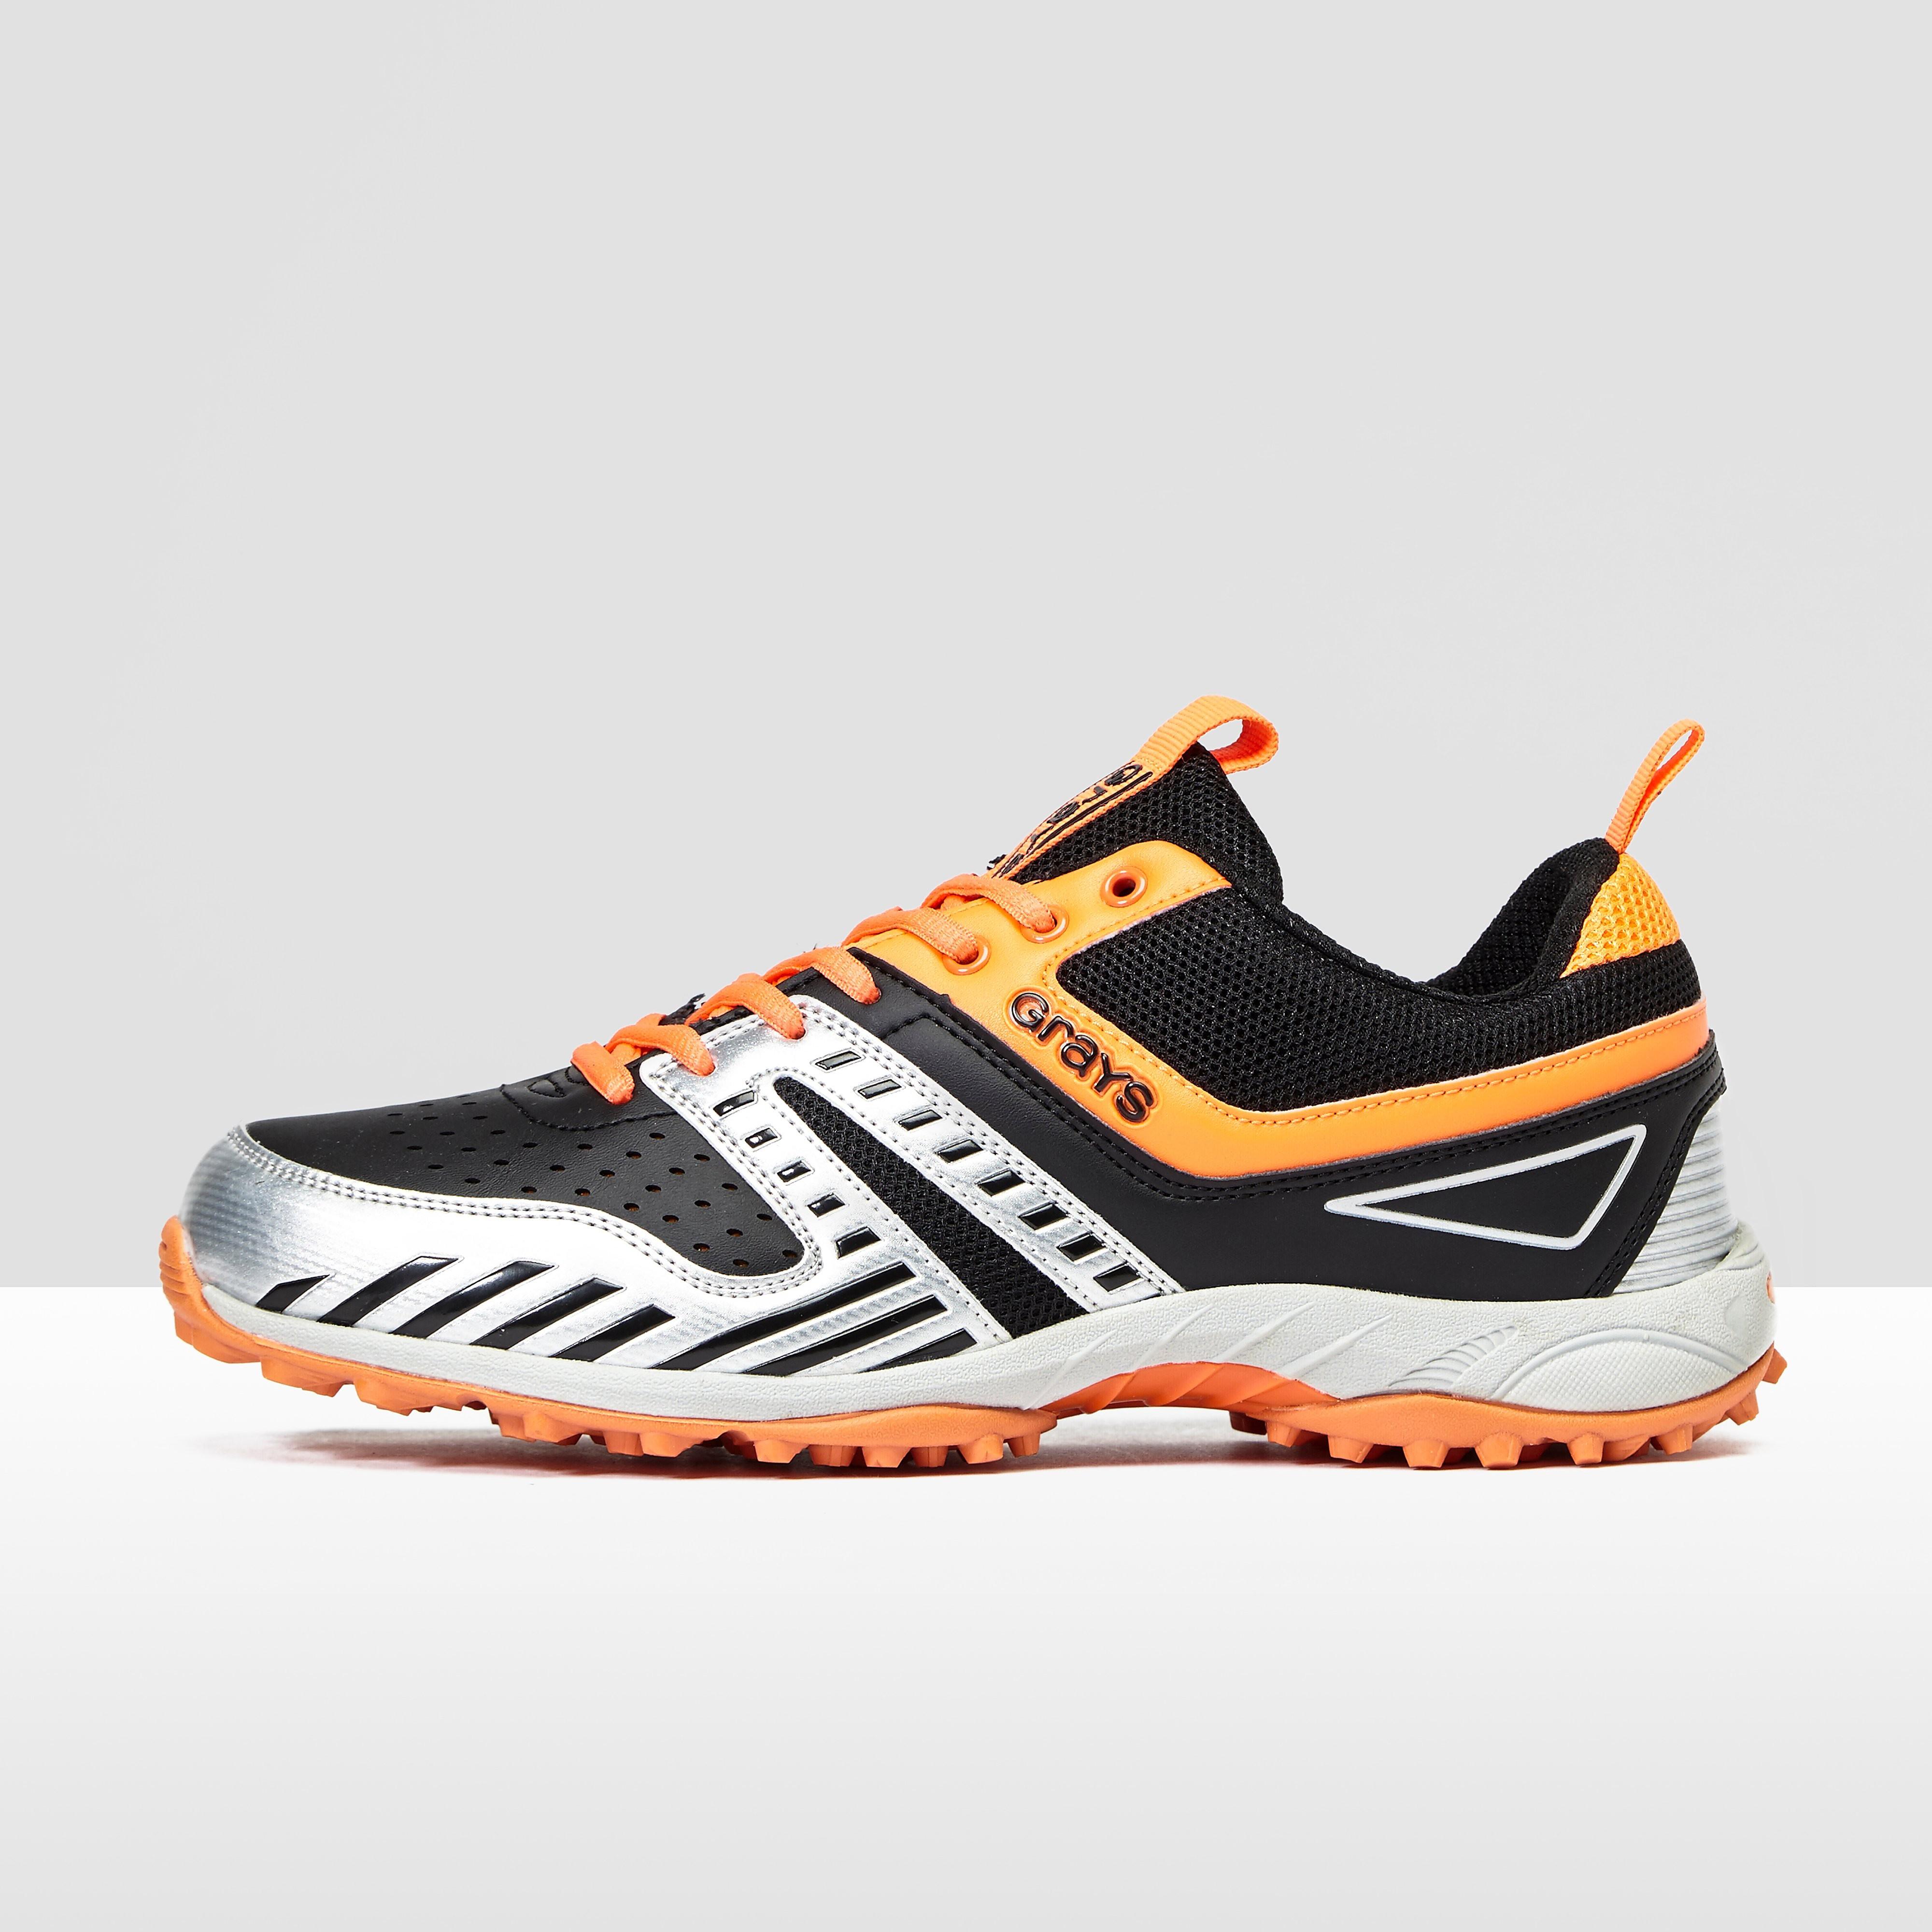 Grays G5000 Men's Hockey Shoes